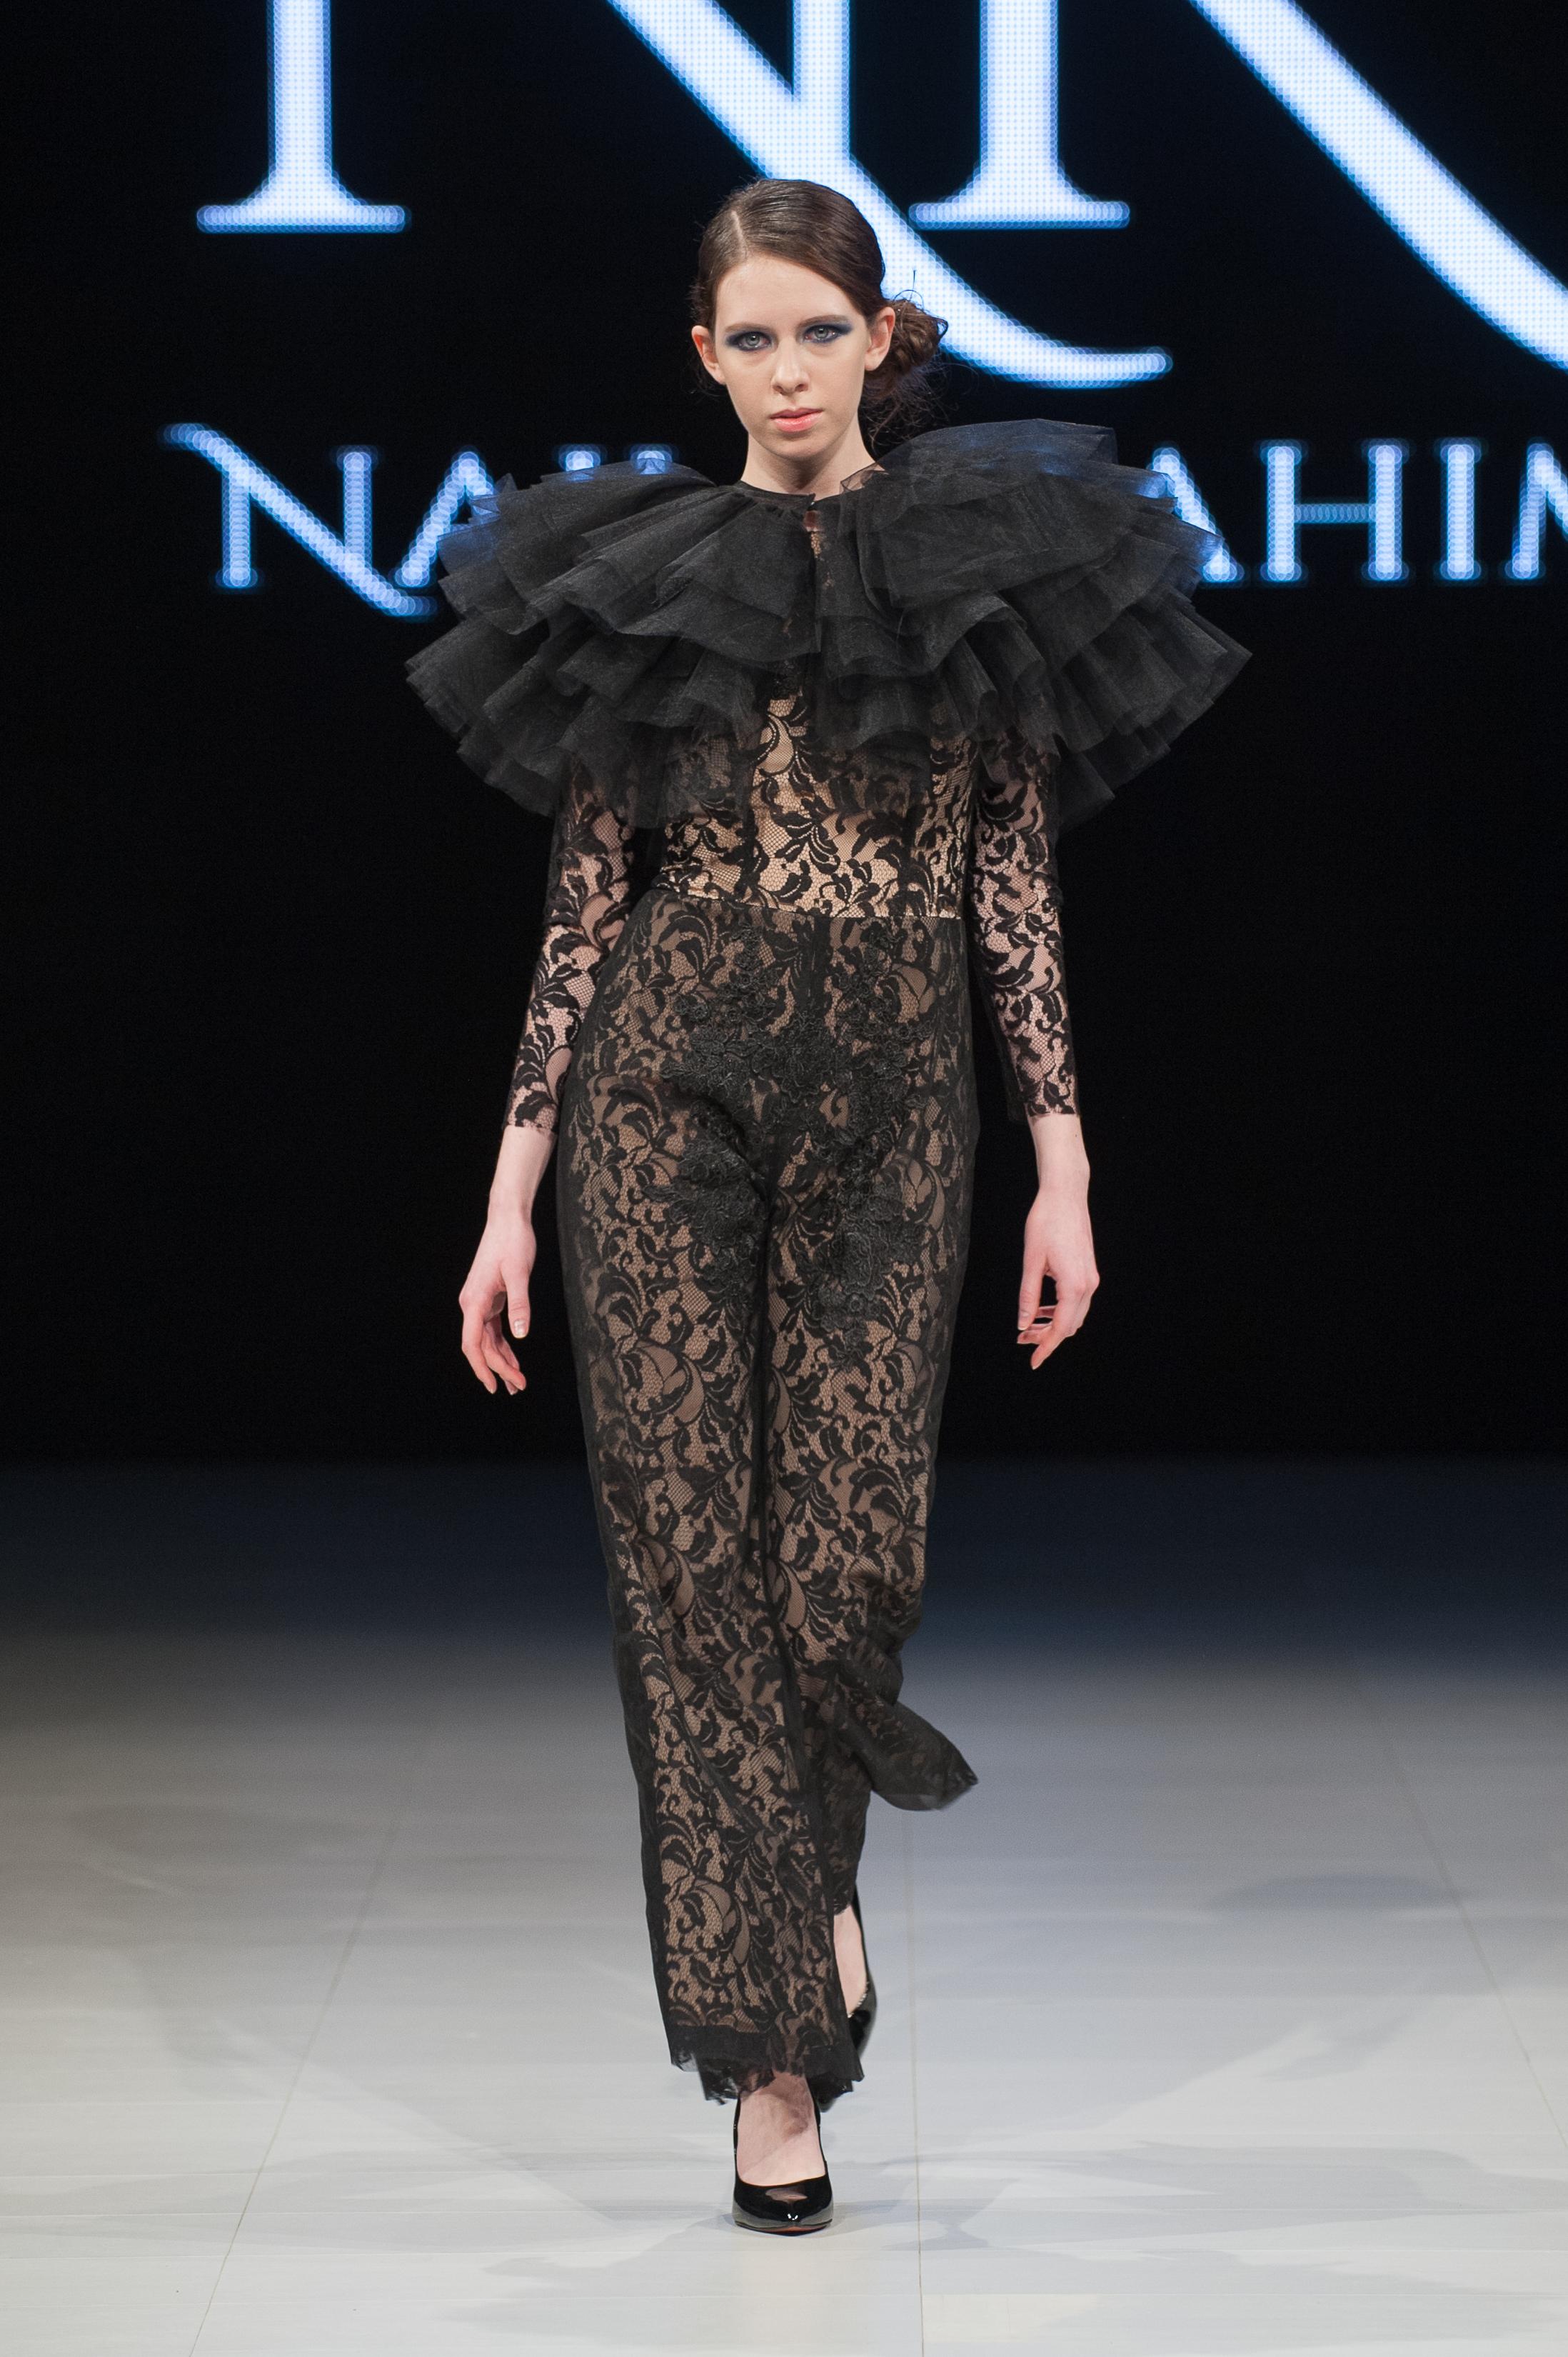 FAT2018-Day1-April17-Najla_Rahimi-Runway-Che_Rosales-LARAWAN-5826.jpg